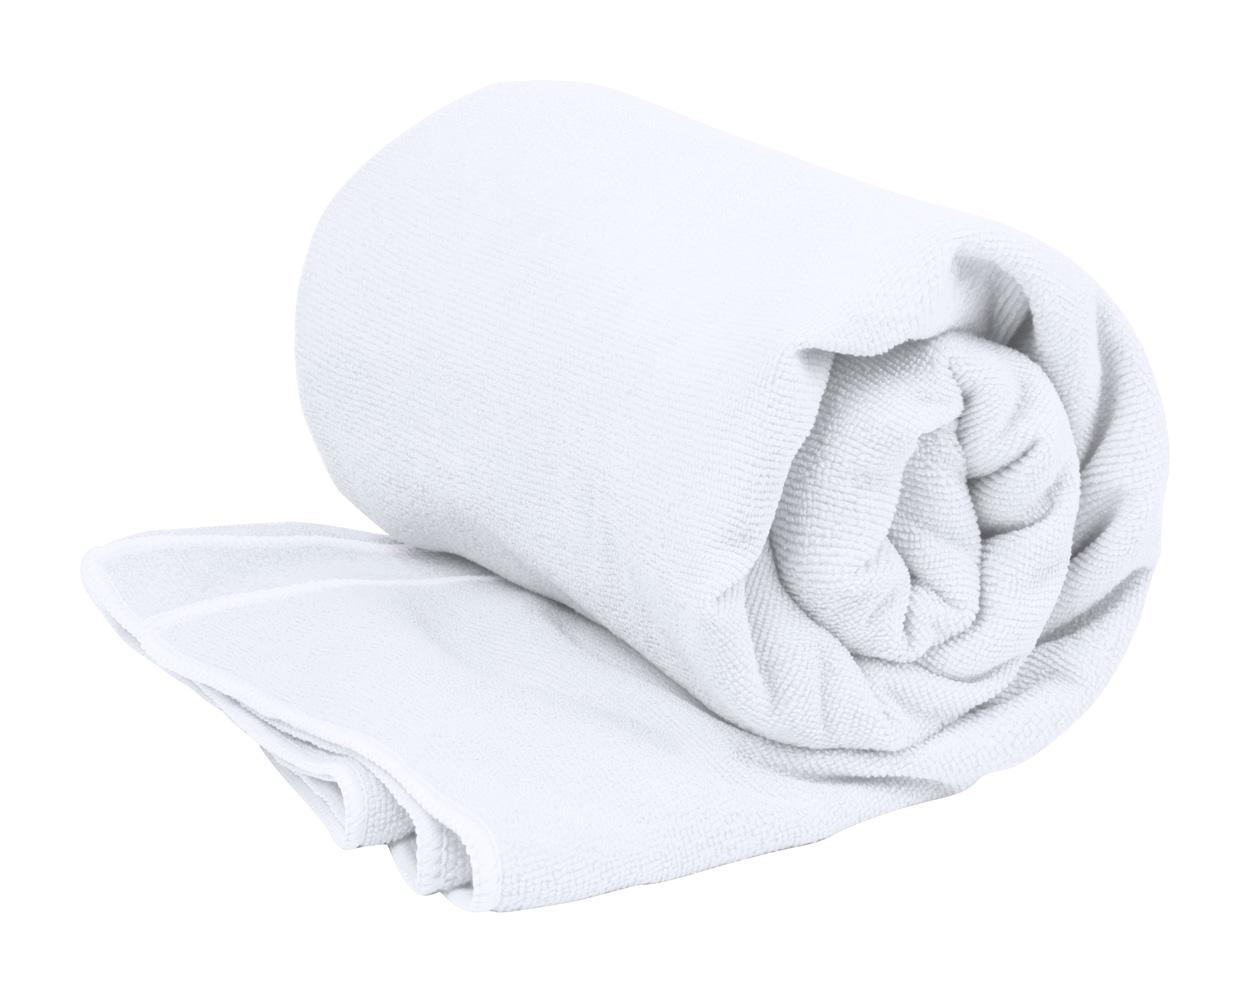 Bayalax asciugamani